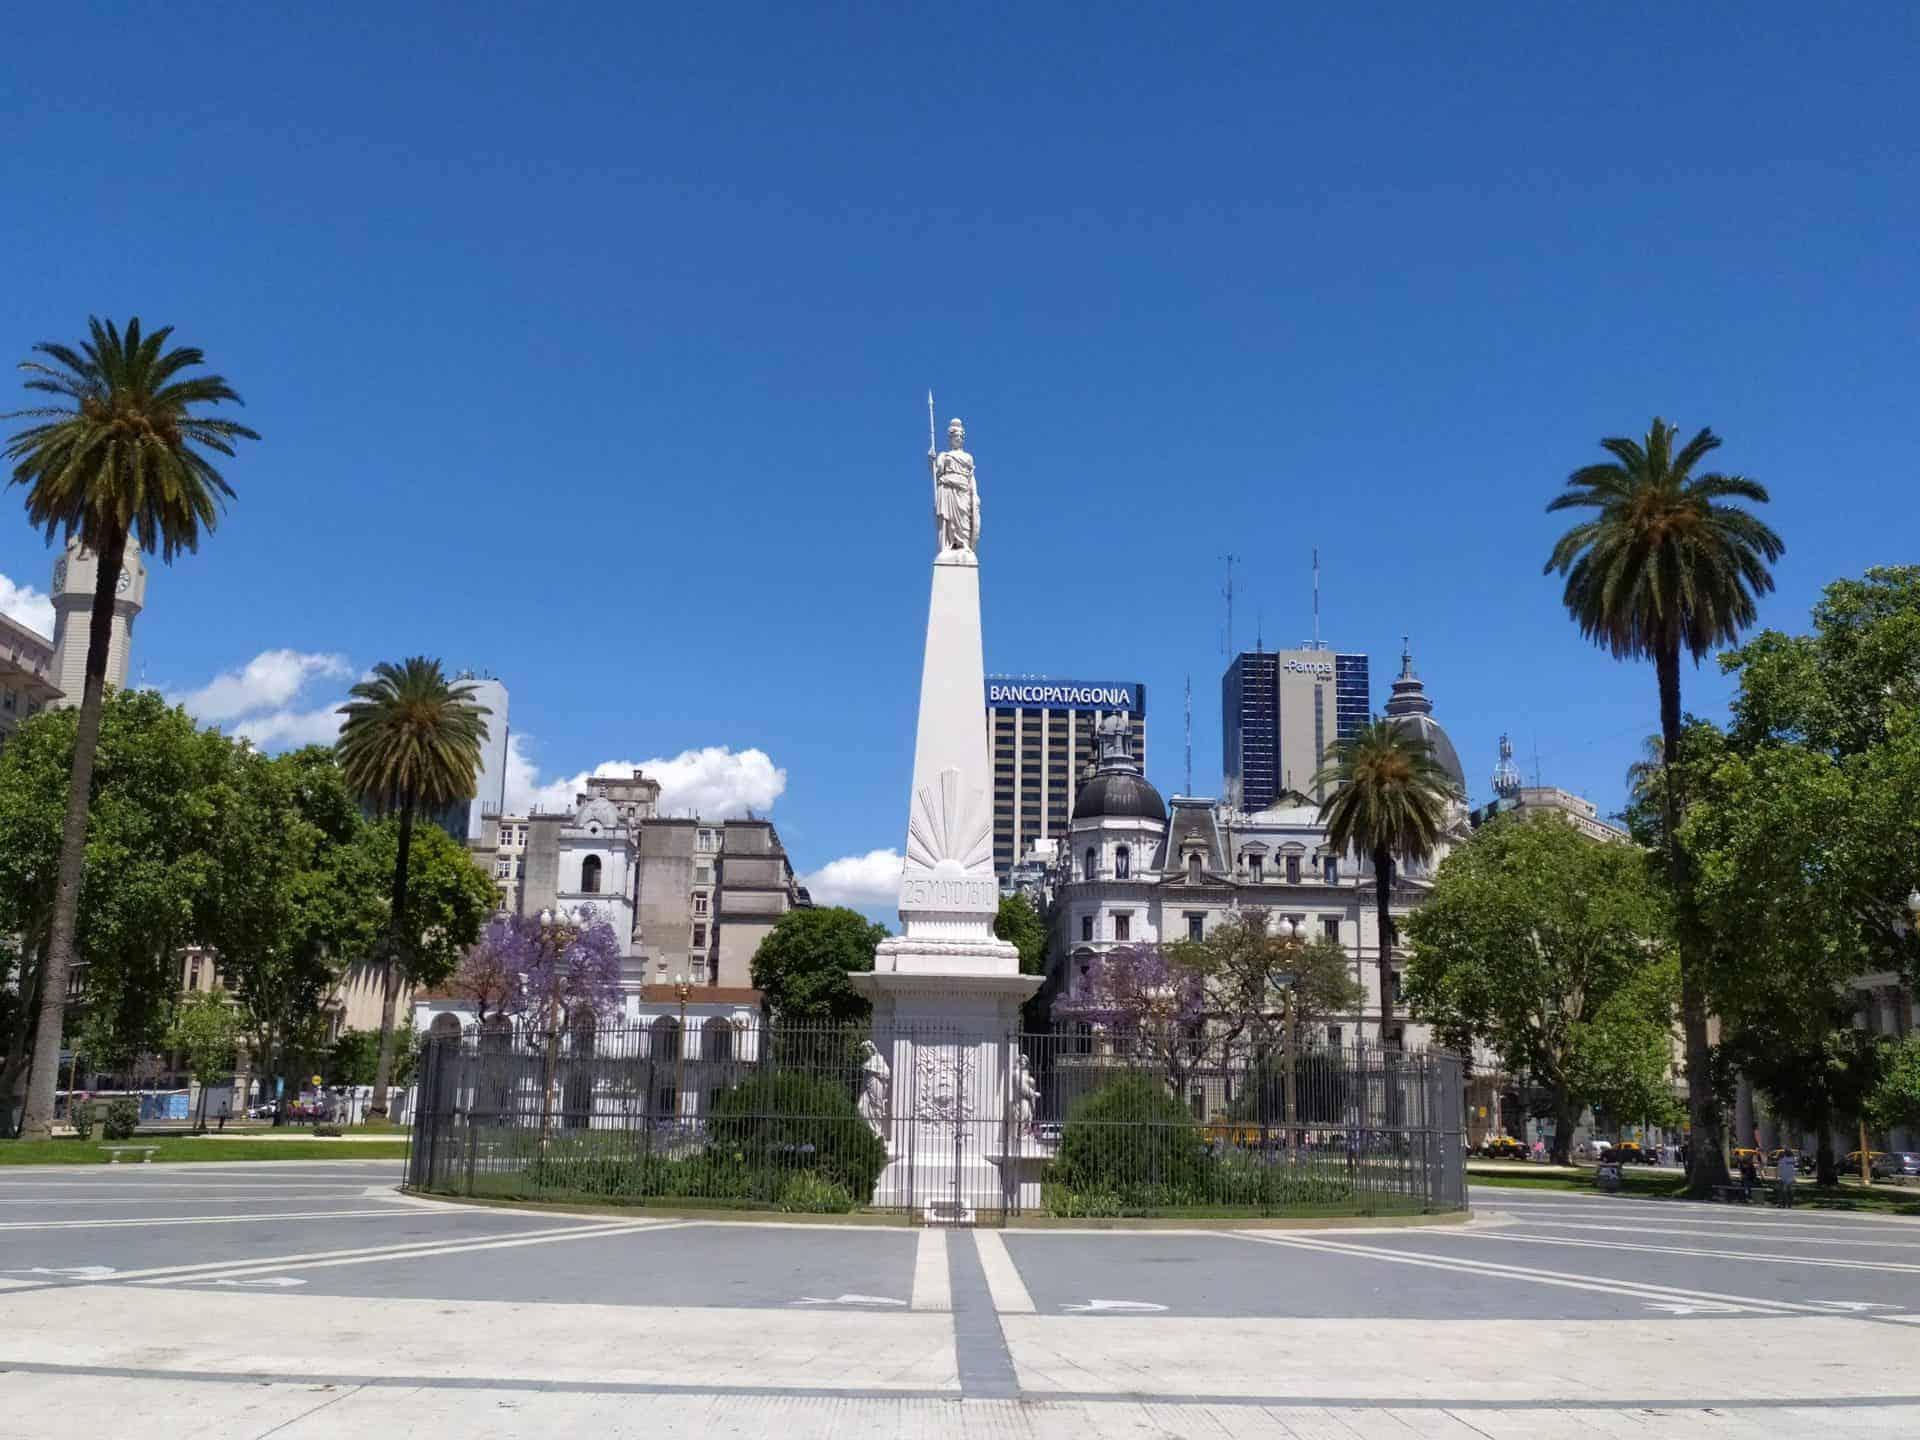 Essentialbuenosaires_tourpoint4_plazademayo,cabildoandcathedral_maypyramid_4